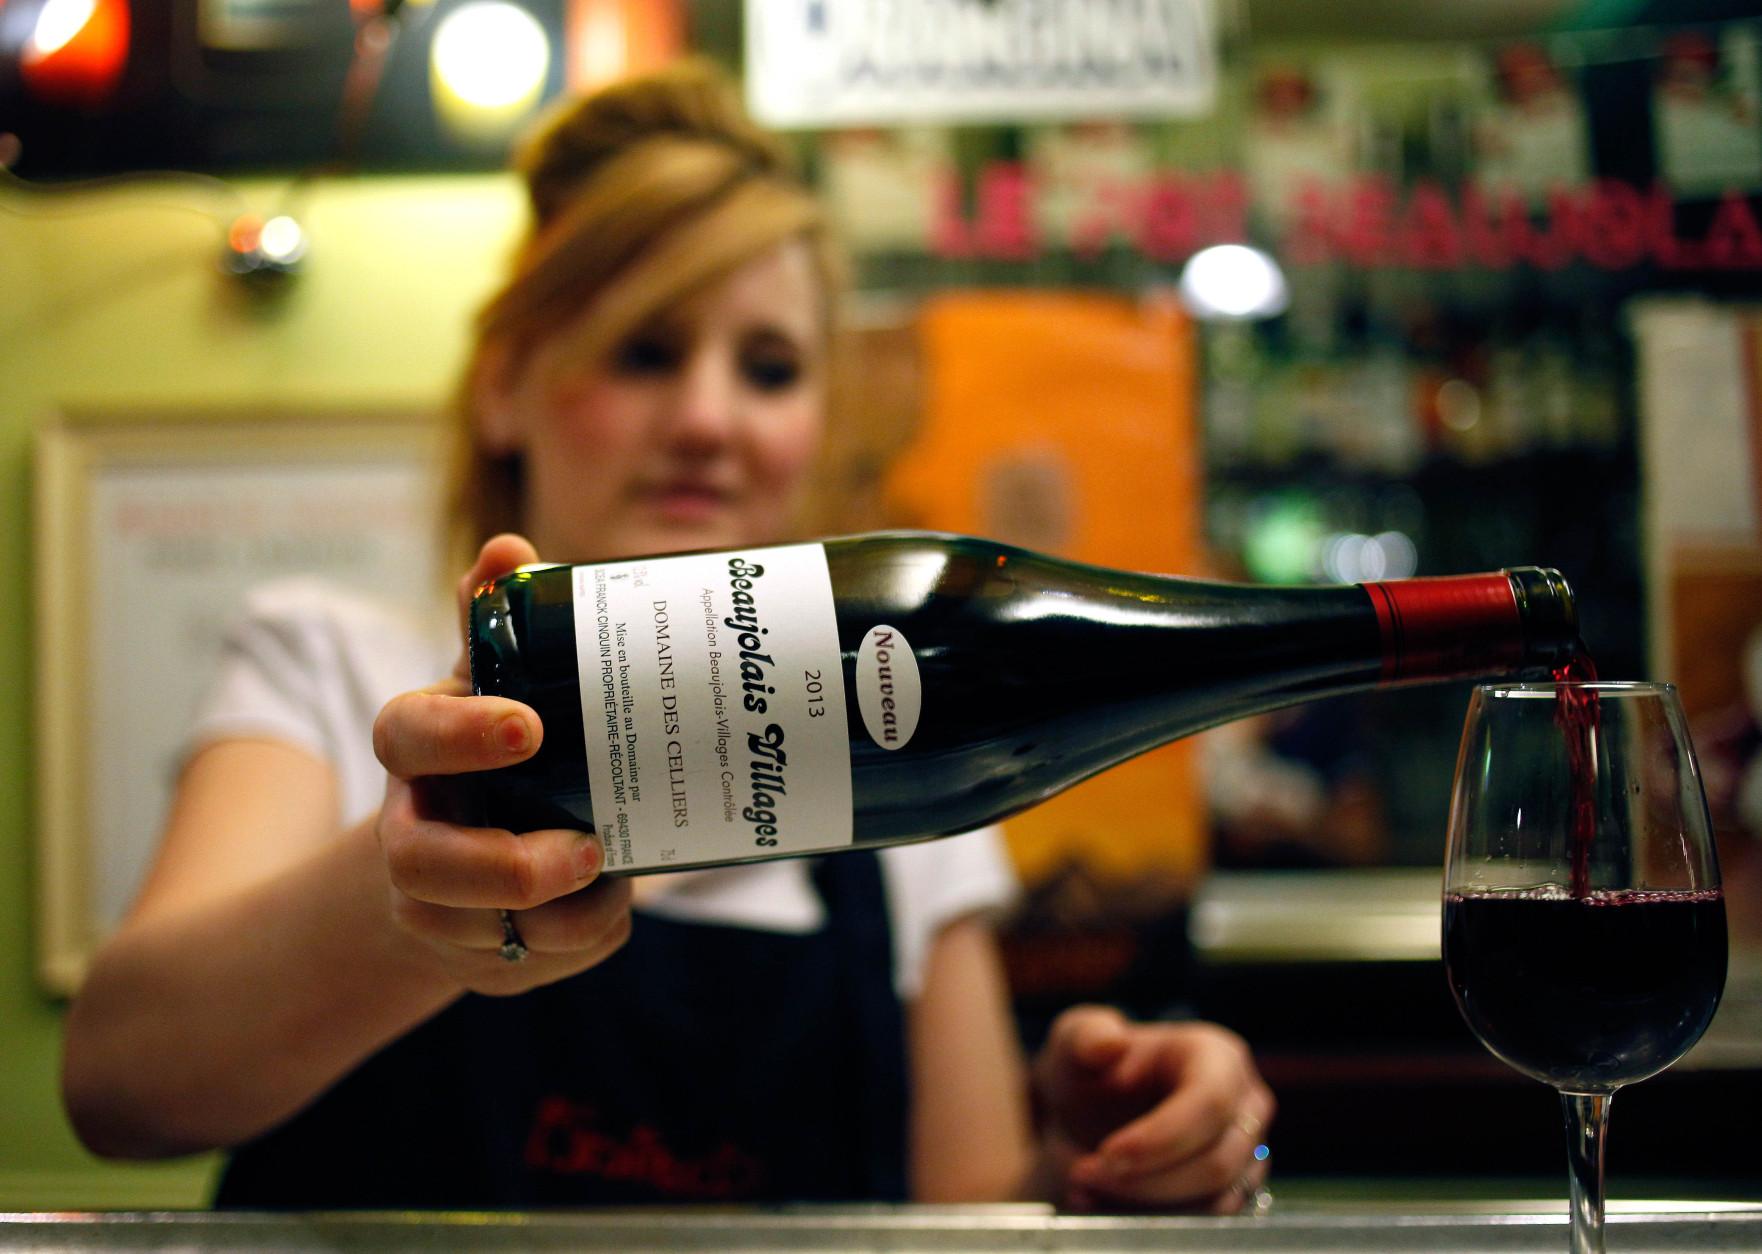 Wine of the Week: Beaujolais Nouveau